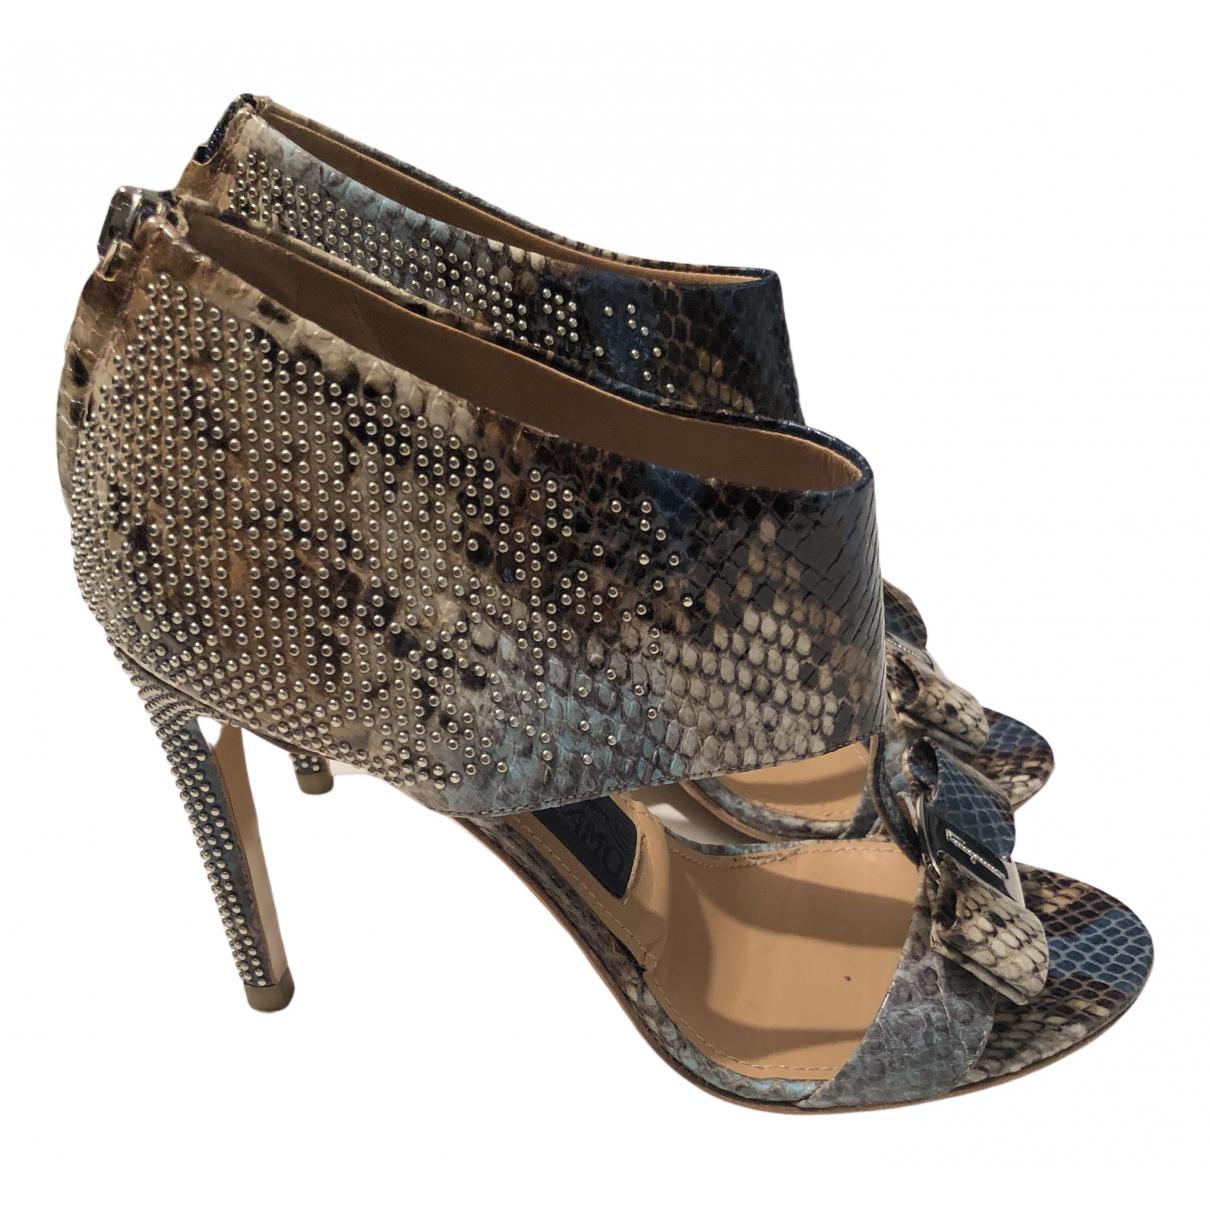 Salvatore Ferragamo \N Water snake Sandals for Women 7.5 US